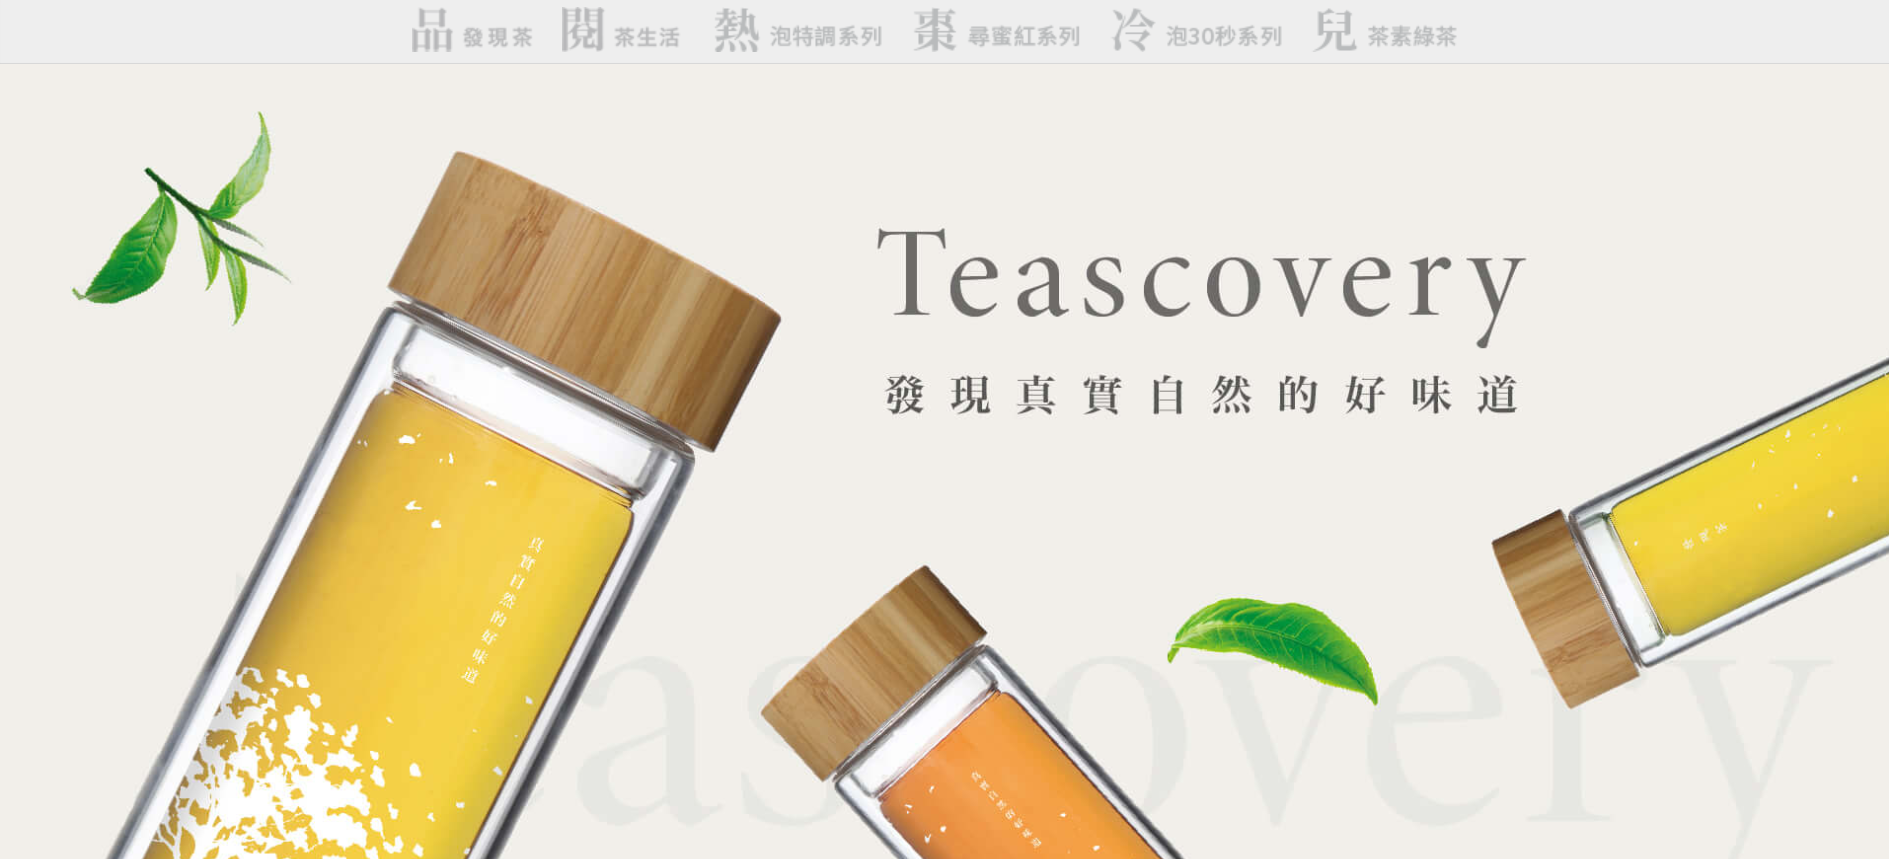 91APP 人氣店家 Teascovery 電商網站